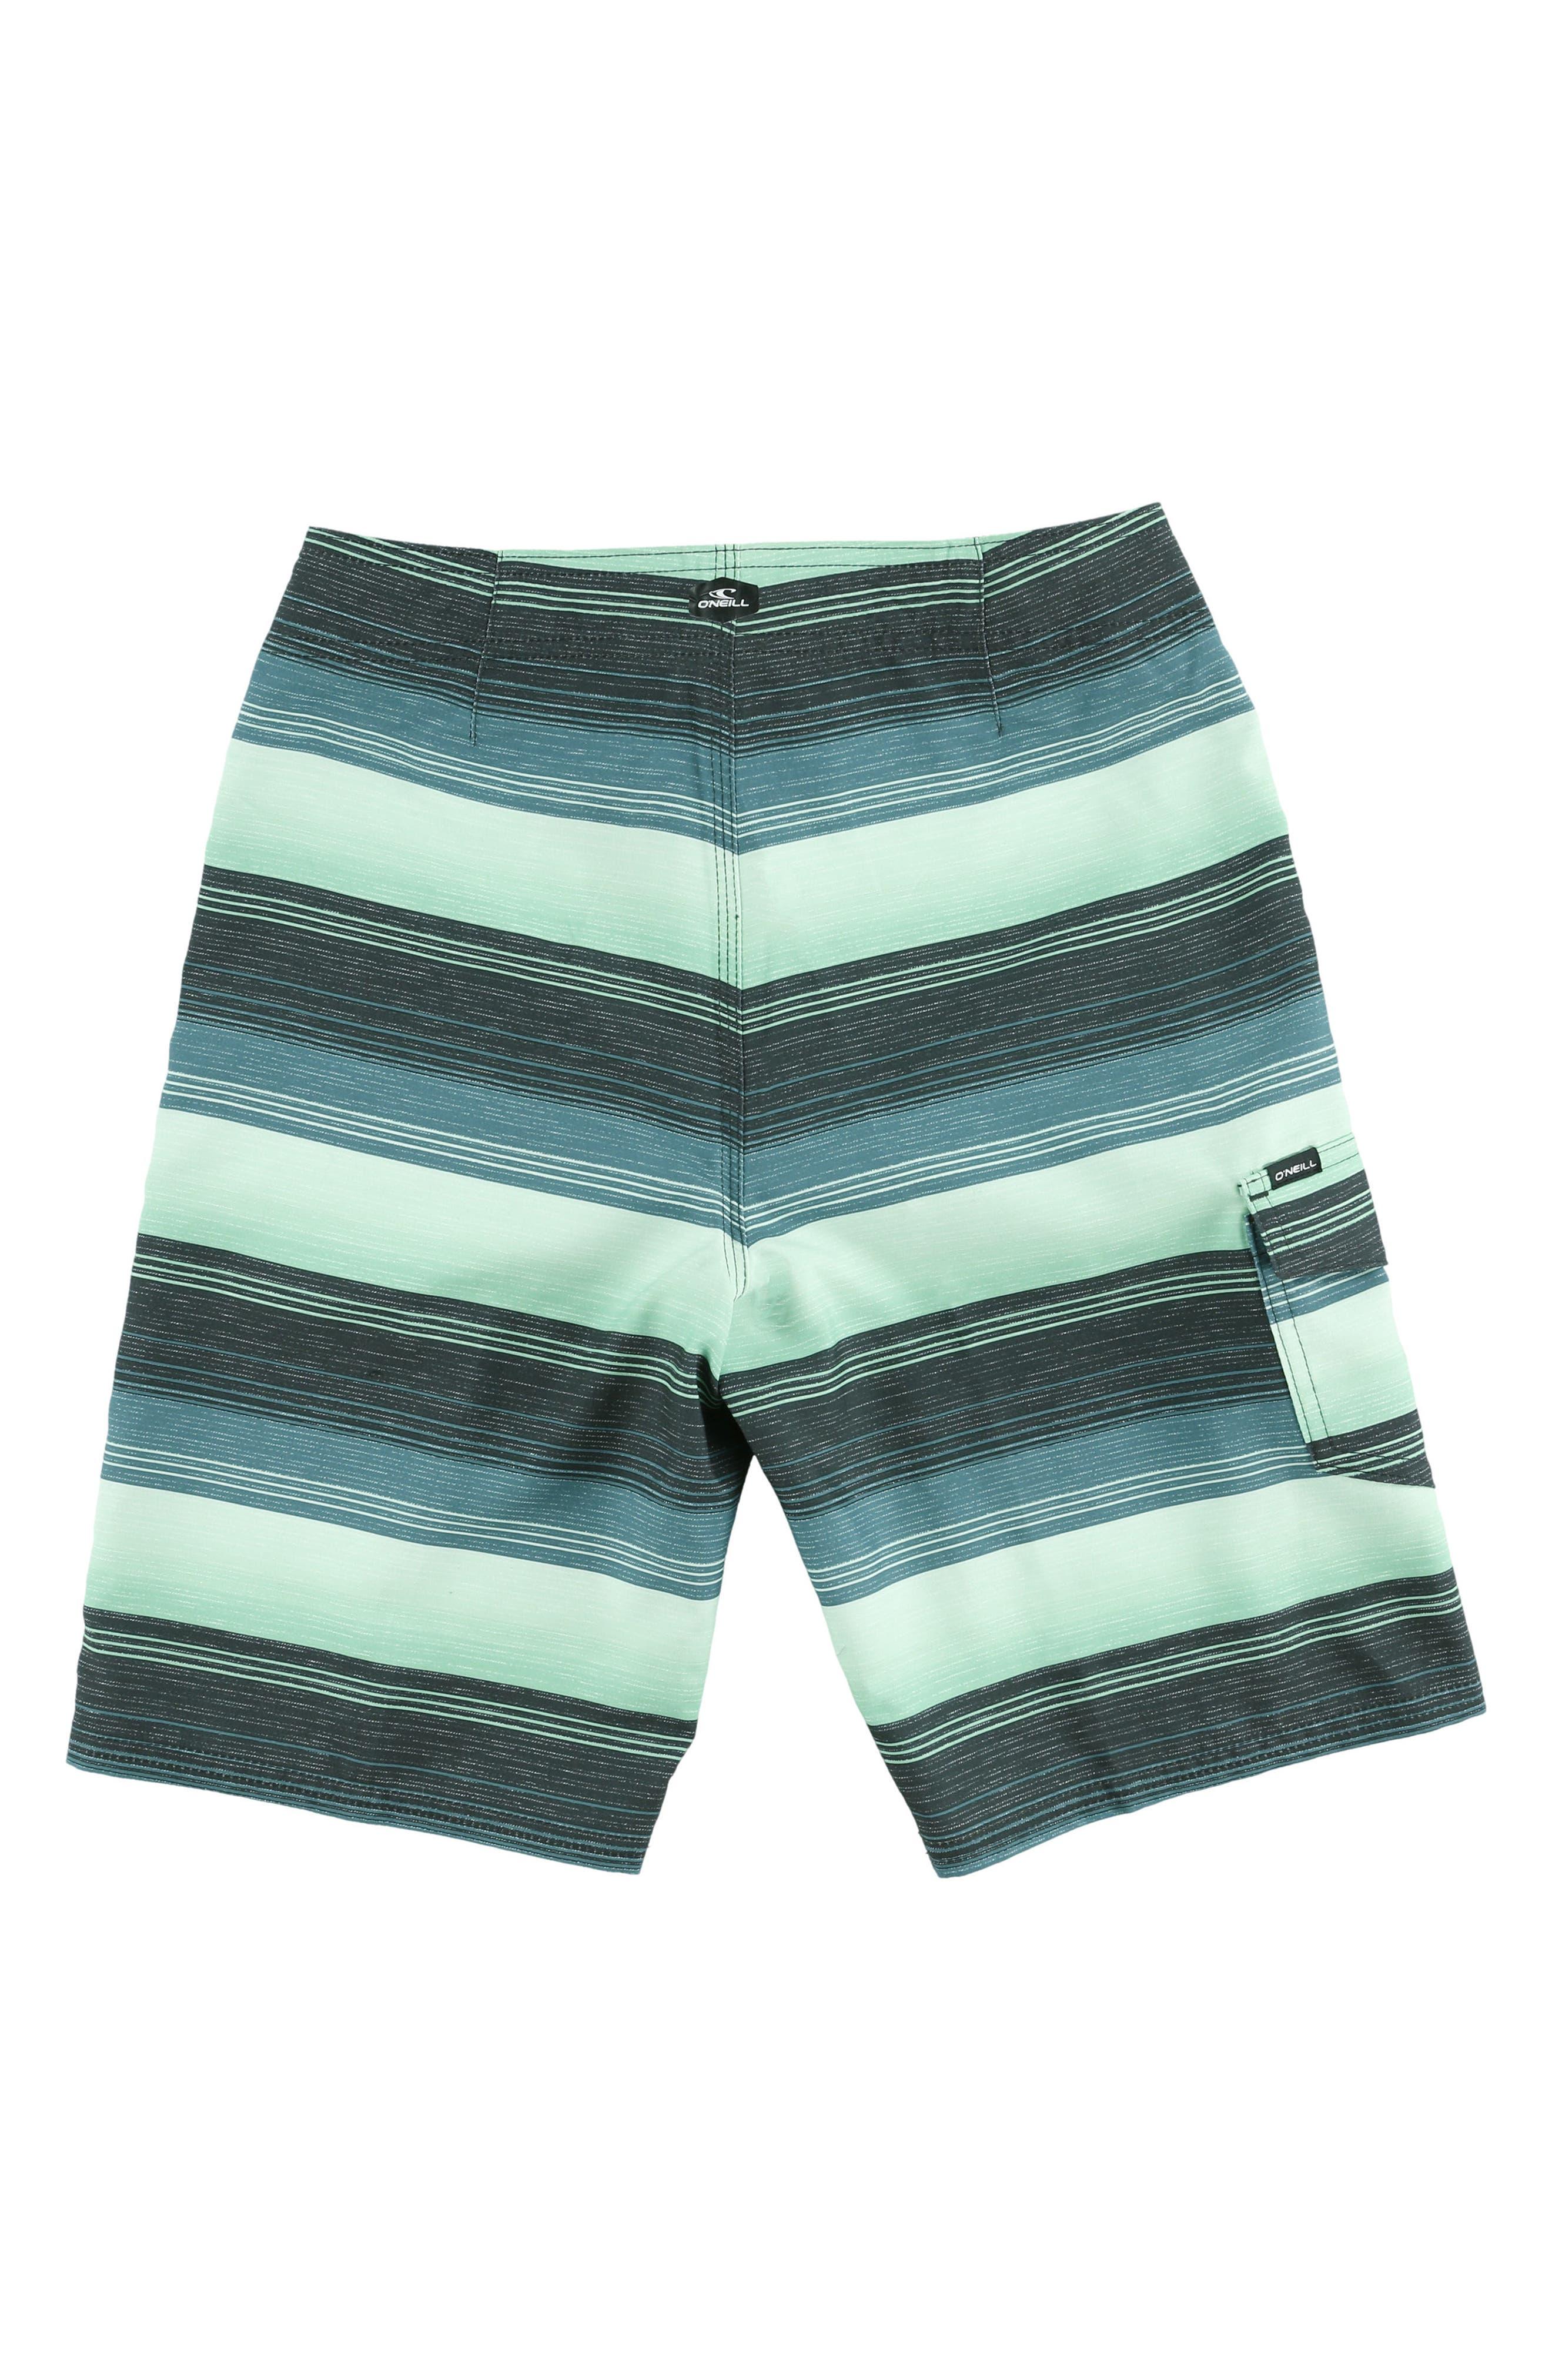 Santa Cruz Stripe Board Shorts,                             Alternate thumbnail 2, color,                             Turq